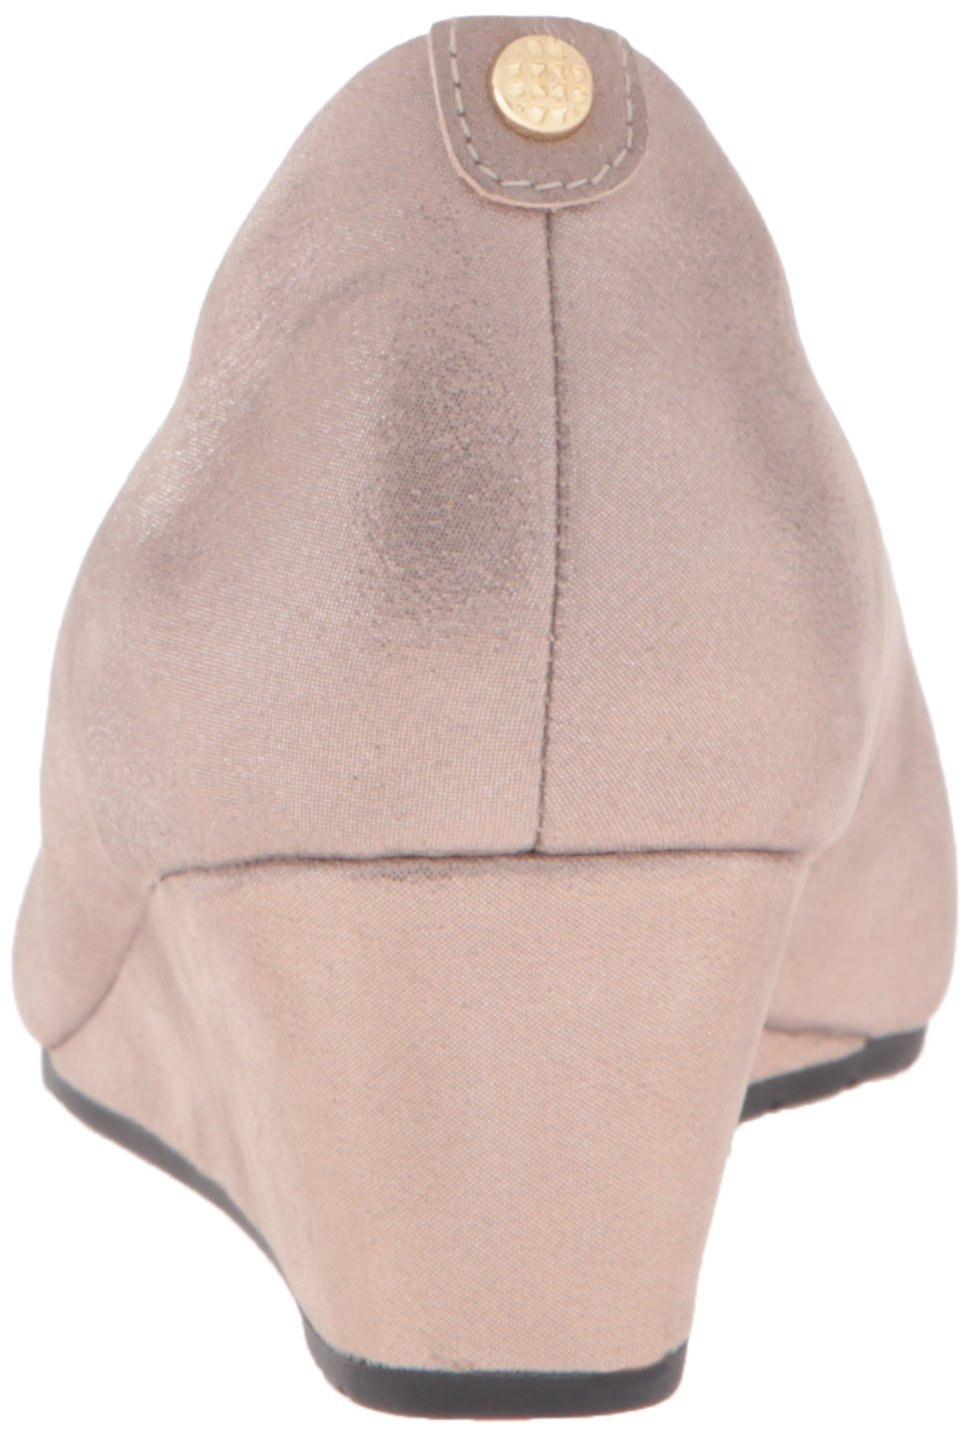 CLARKS Women's Vendra Bloom B(M) Wedge Pump B0195EDFCQ 8 B(M) Bloom US|Champagne Metallic Leather e8bfbb